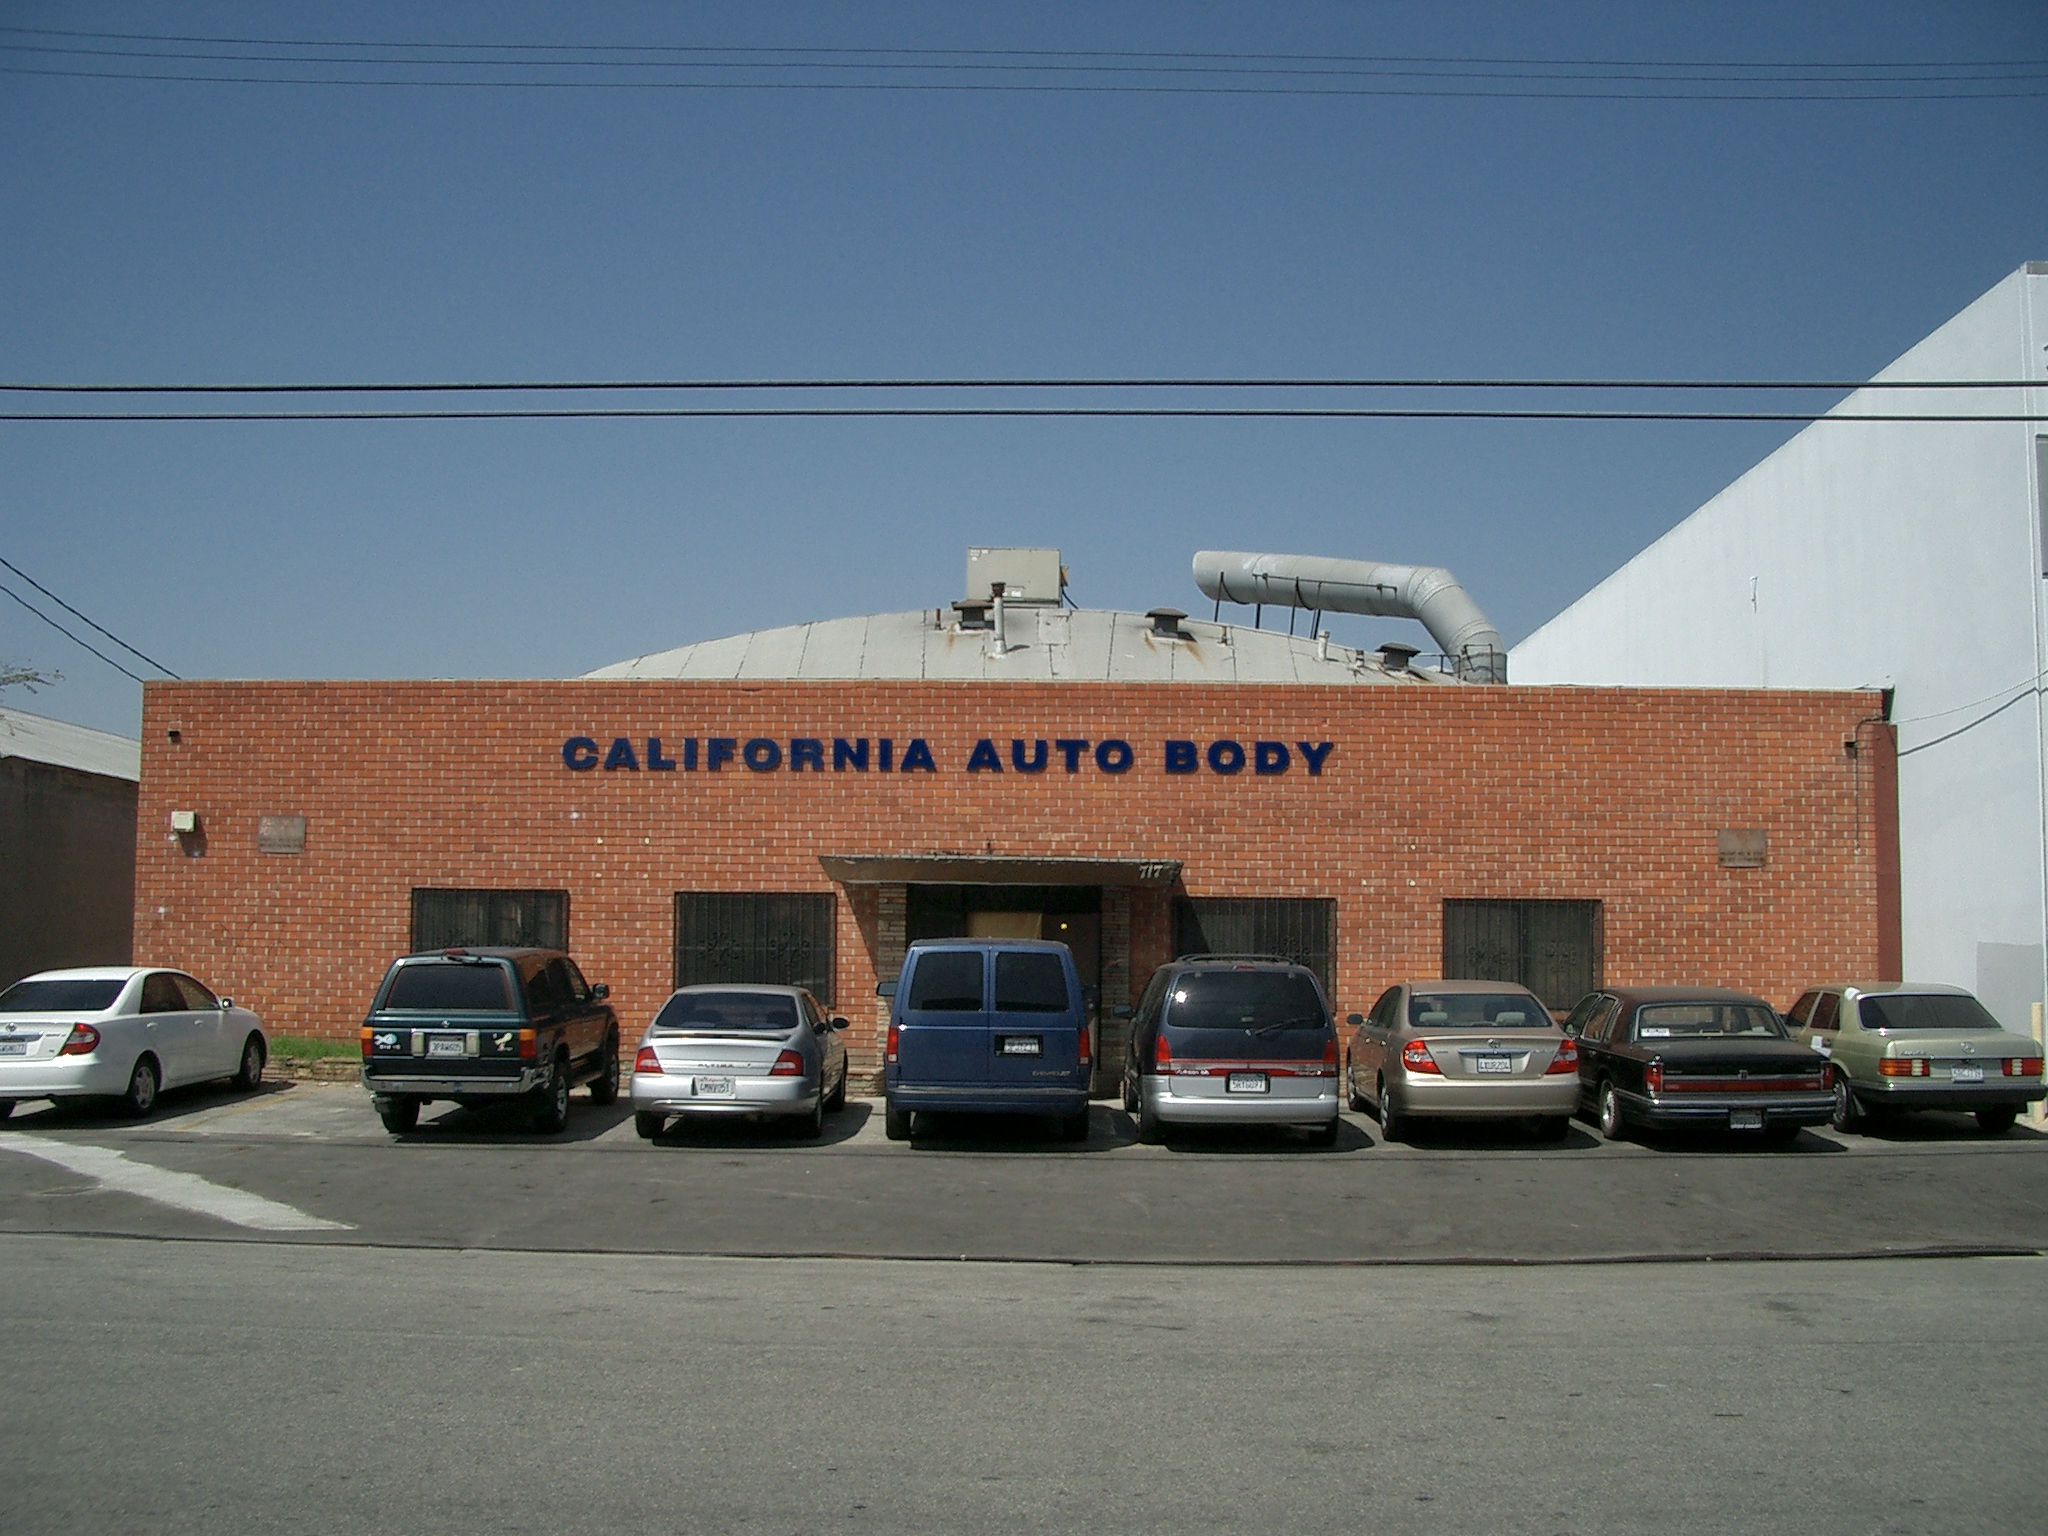 California Auto body street view